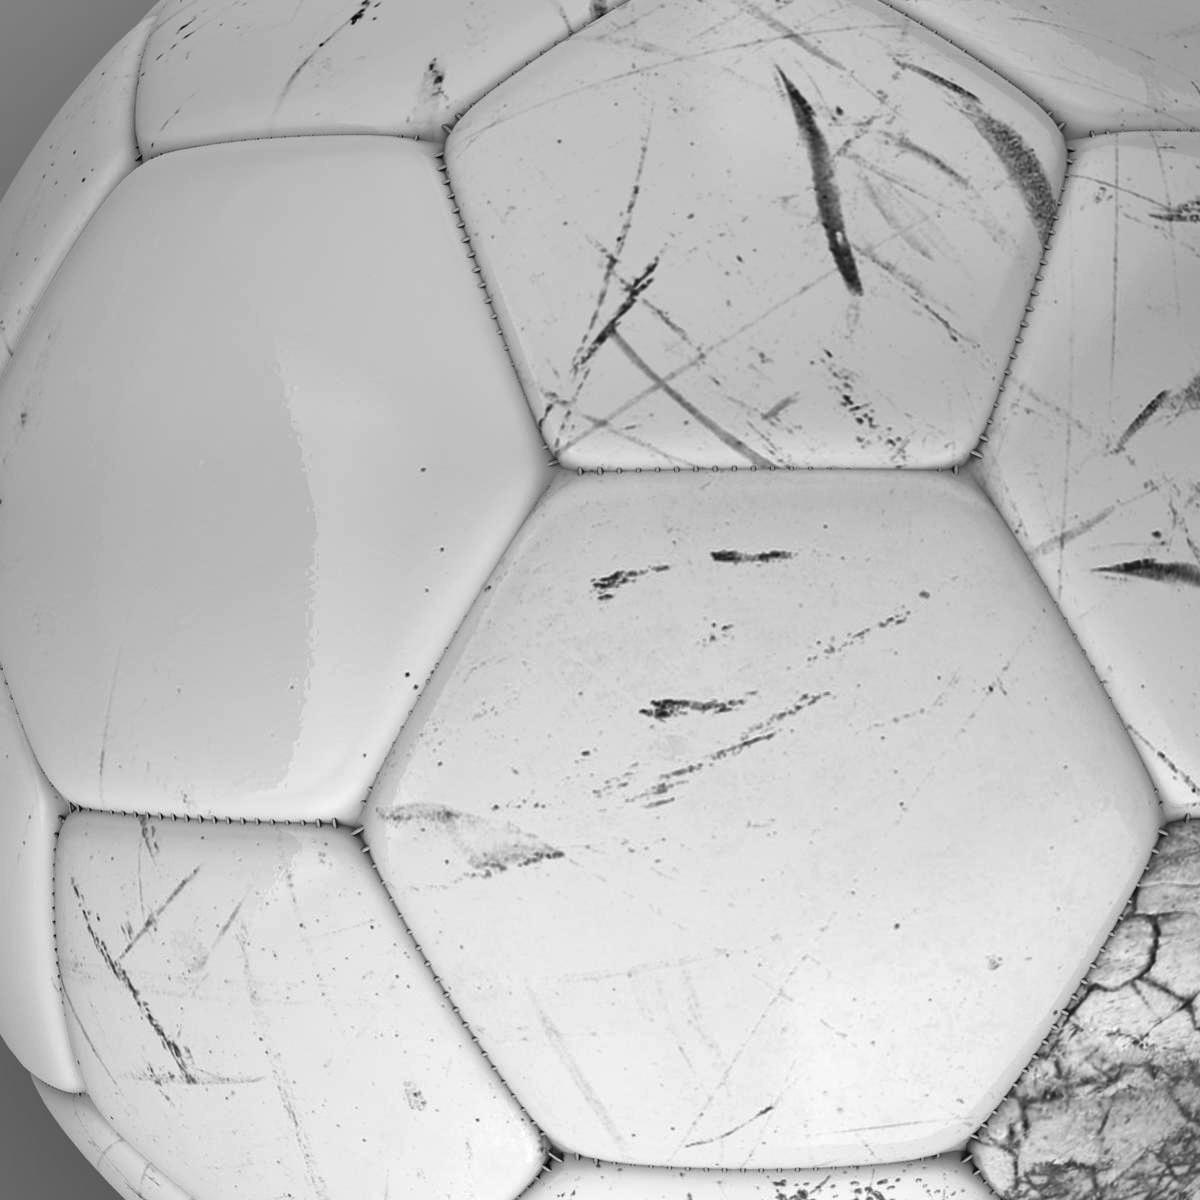 soccerball цагаан 3d загвар 3ds max fbx c4d ma mb obj 205180